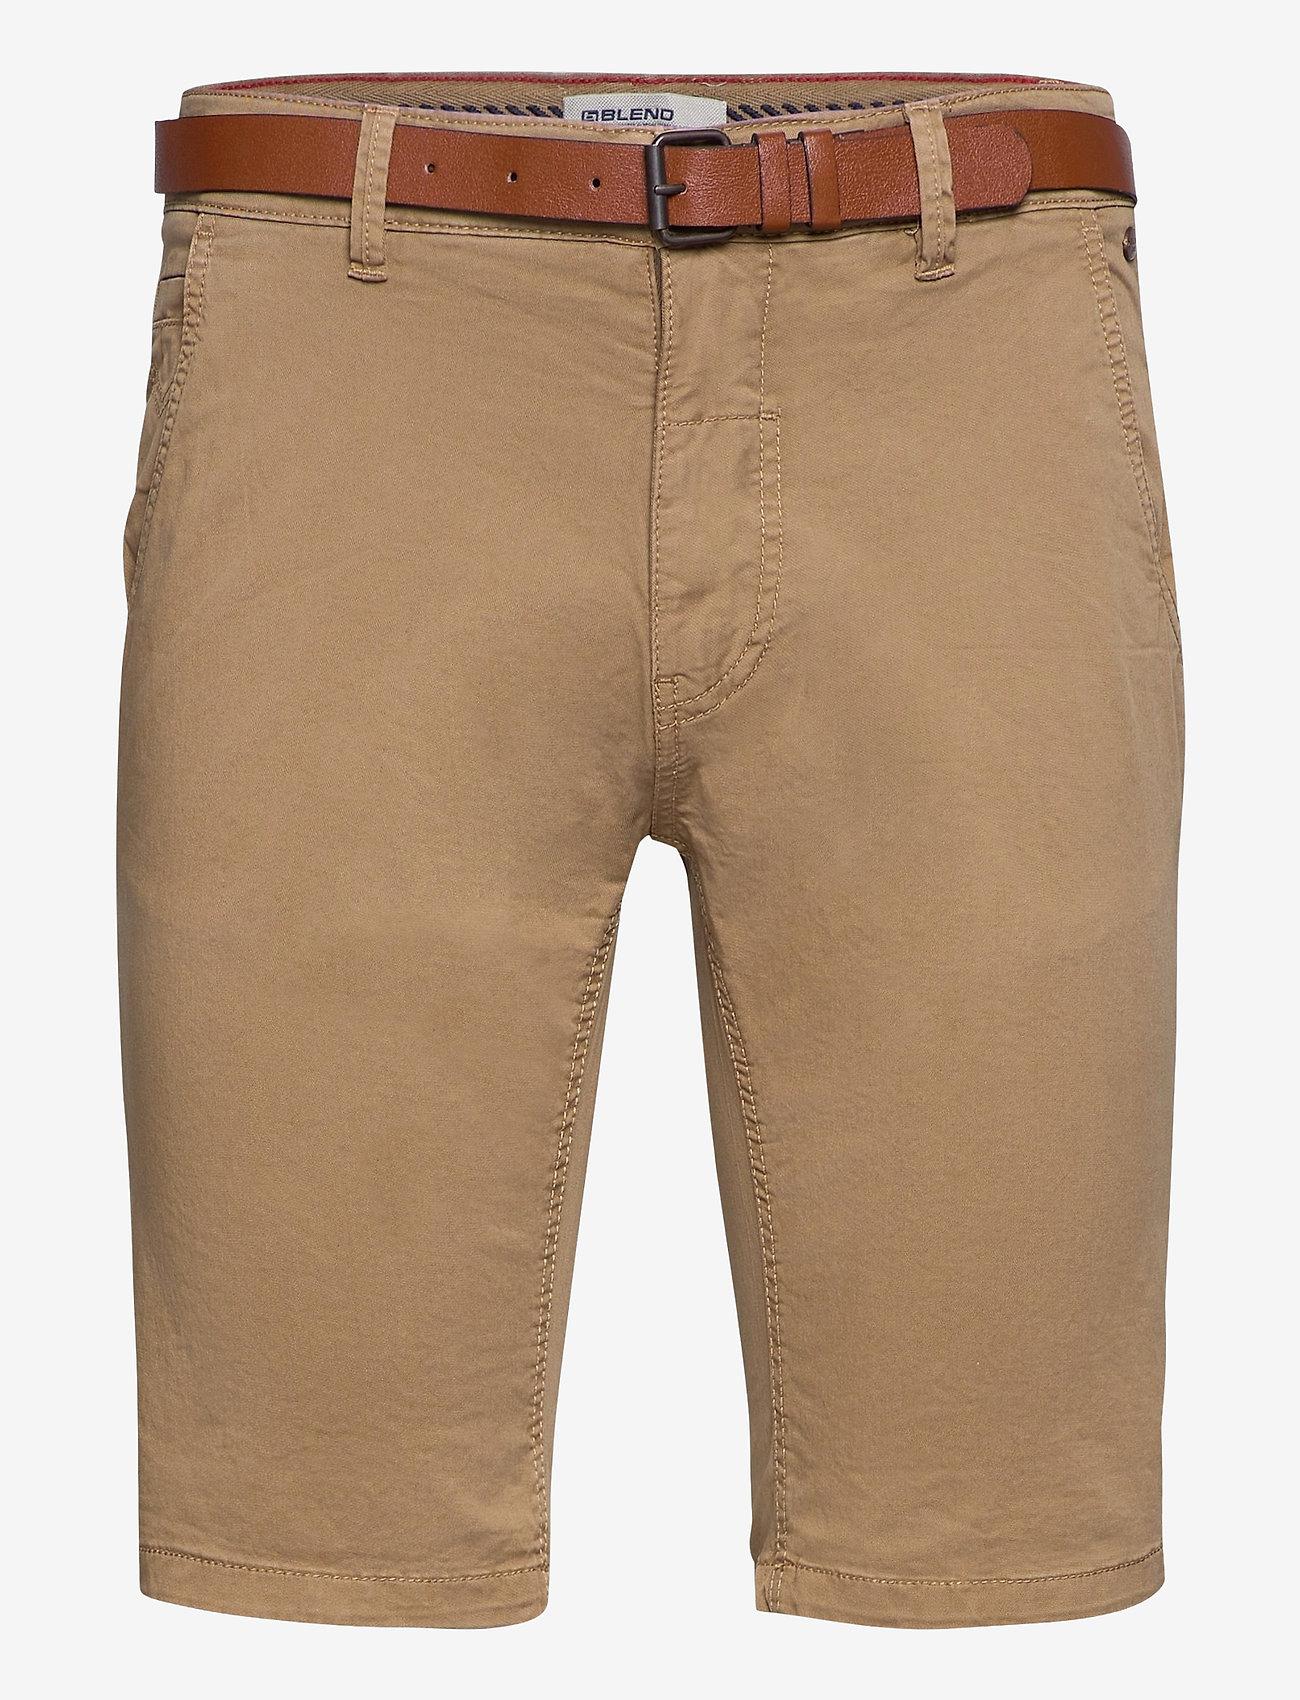 Blend - Shorts - chinos shorts - lead gray - 0